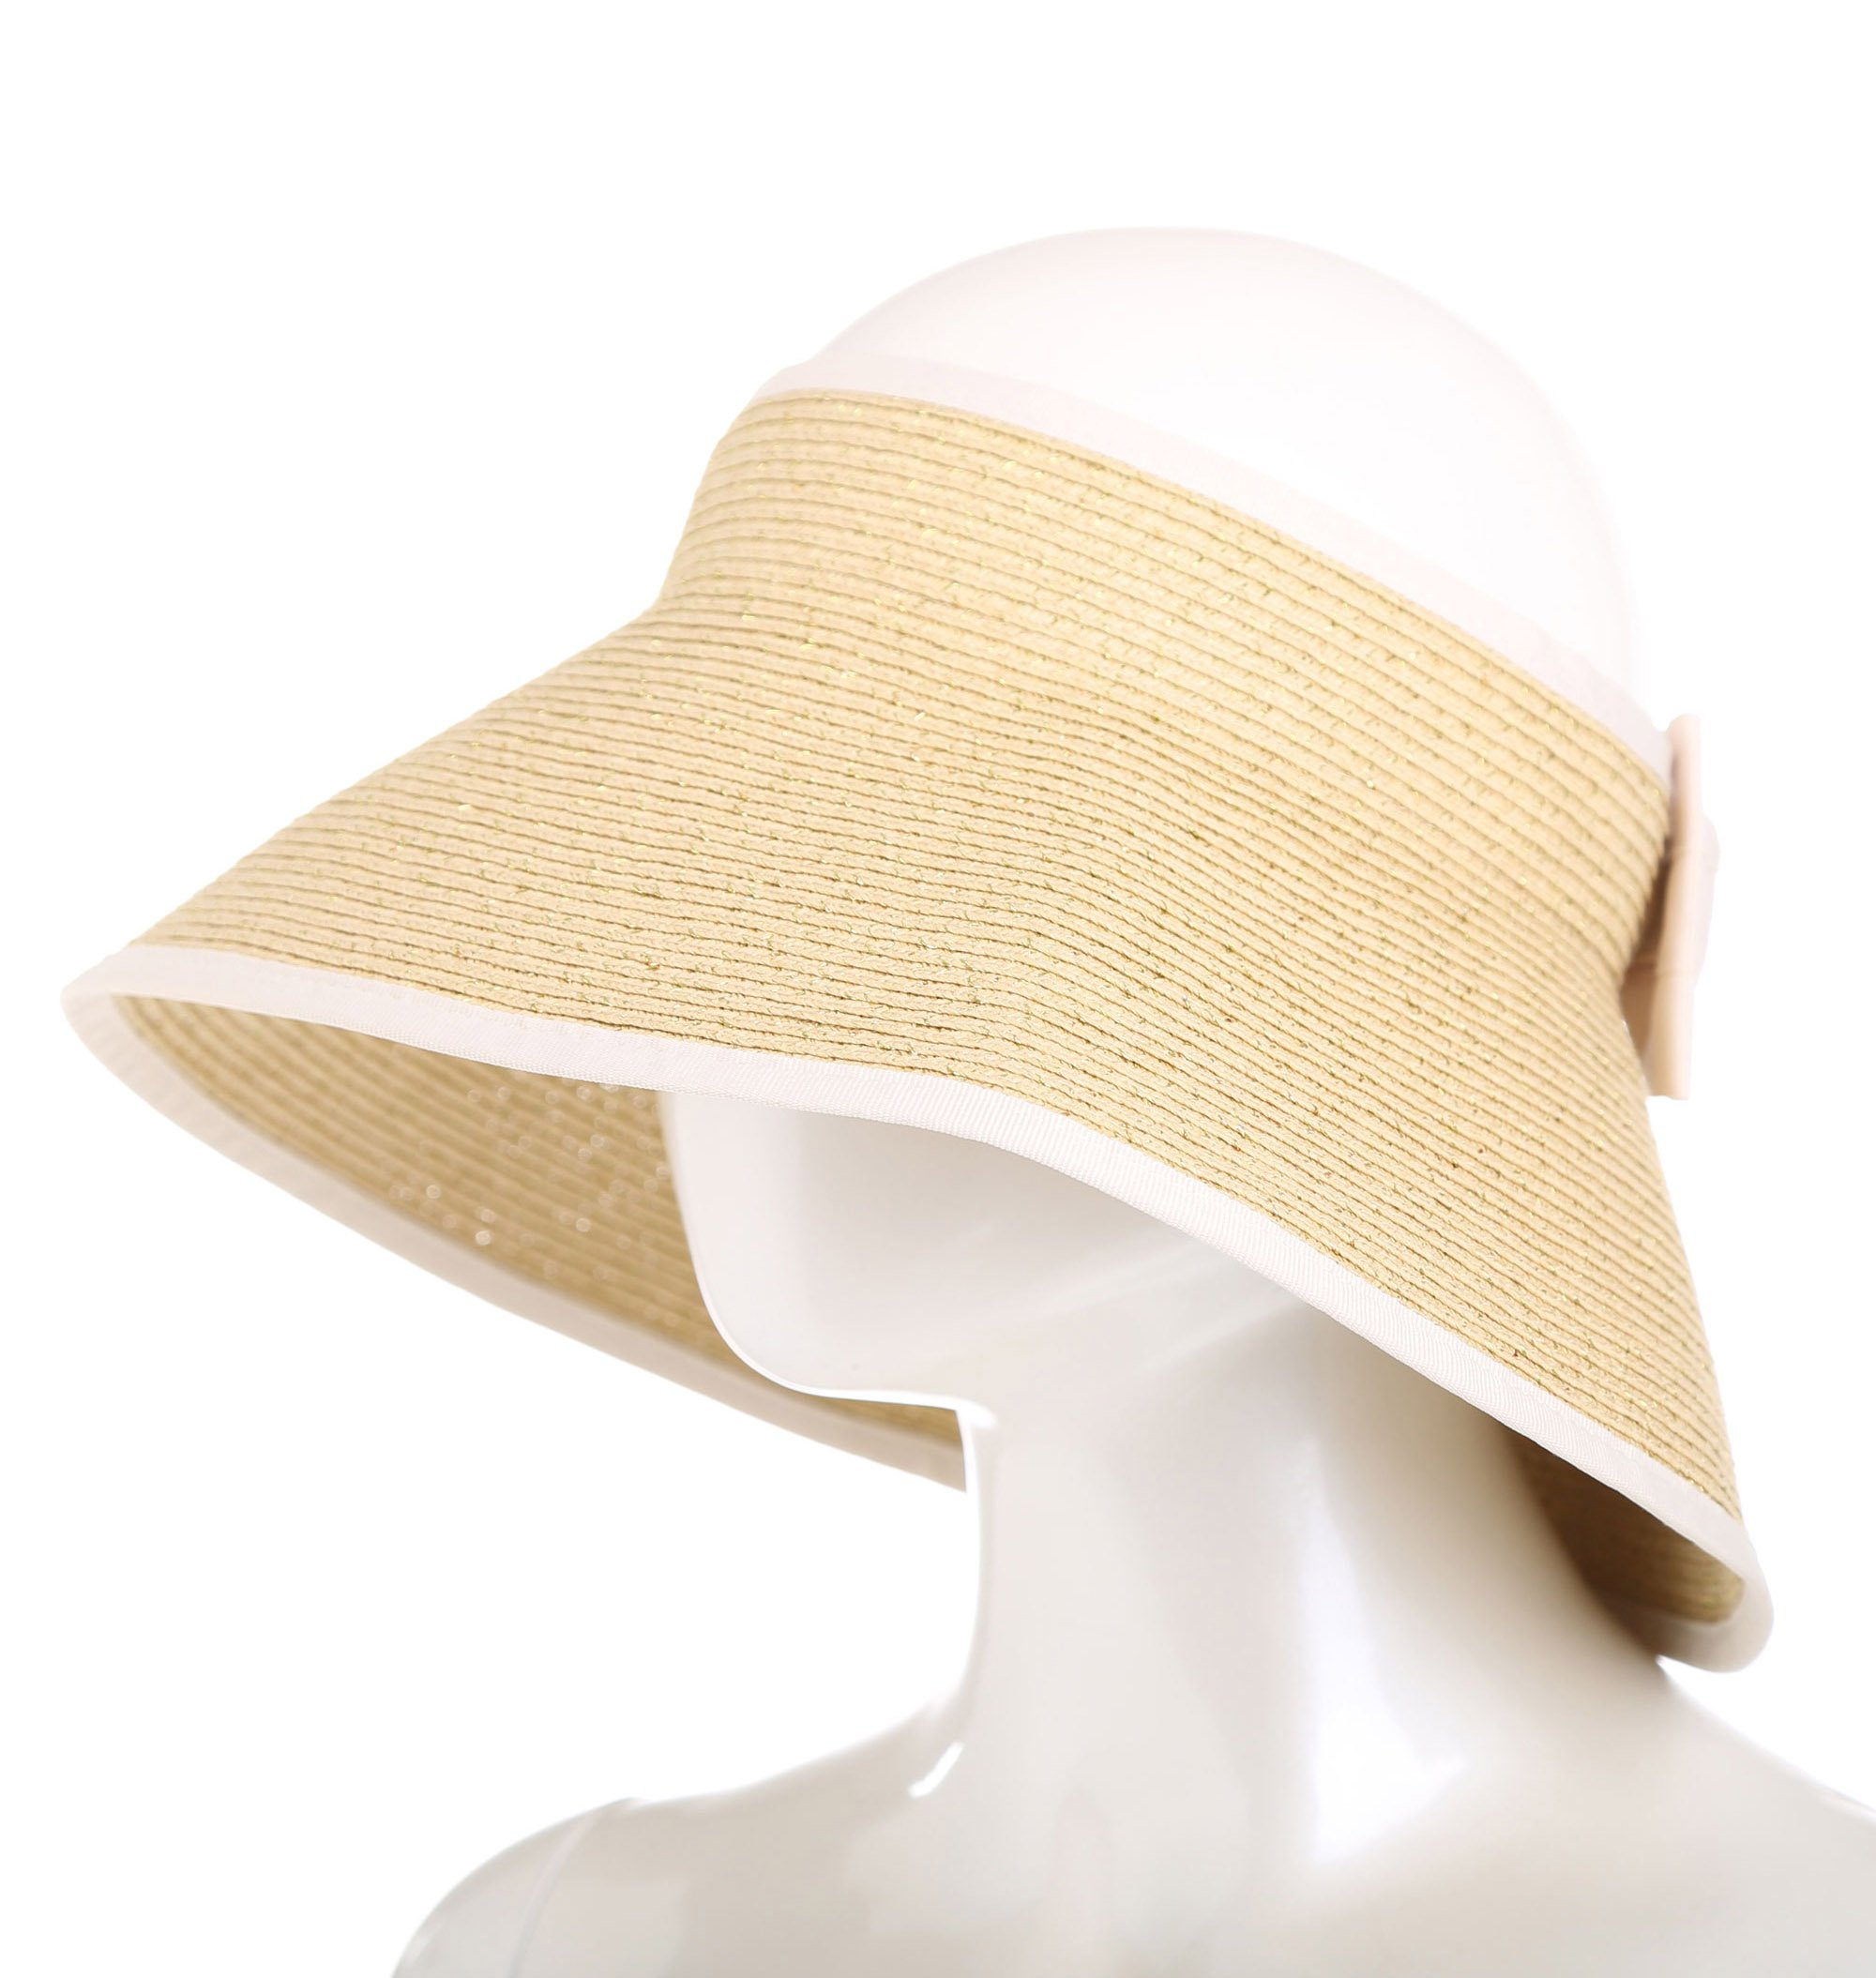 SunviewGolf svg Women's Summer Sun Golf Visor Beach Straw Hats Wide Brim Foldable Khaki